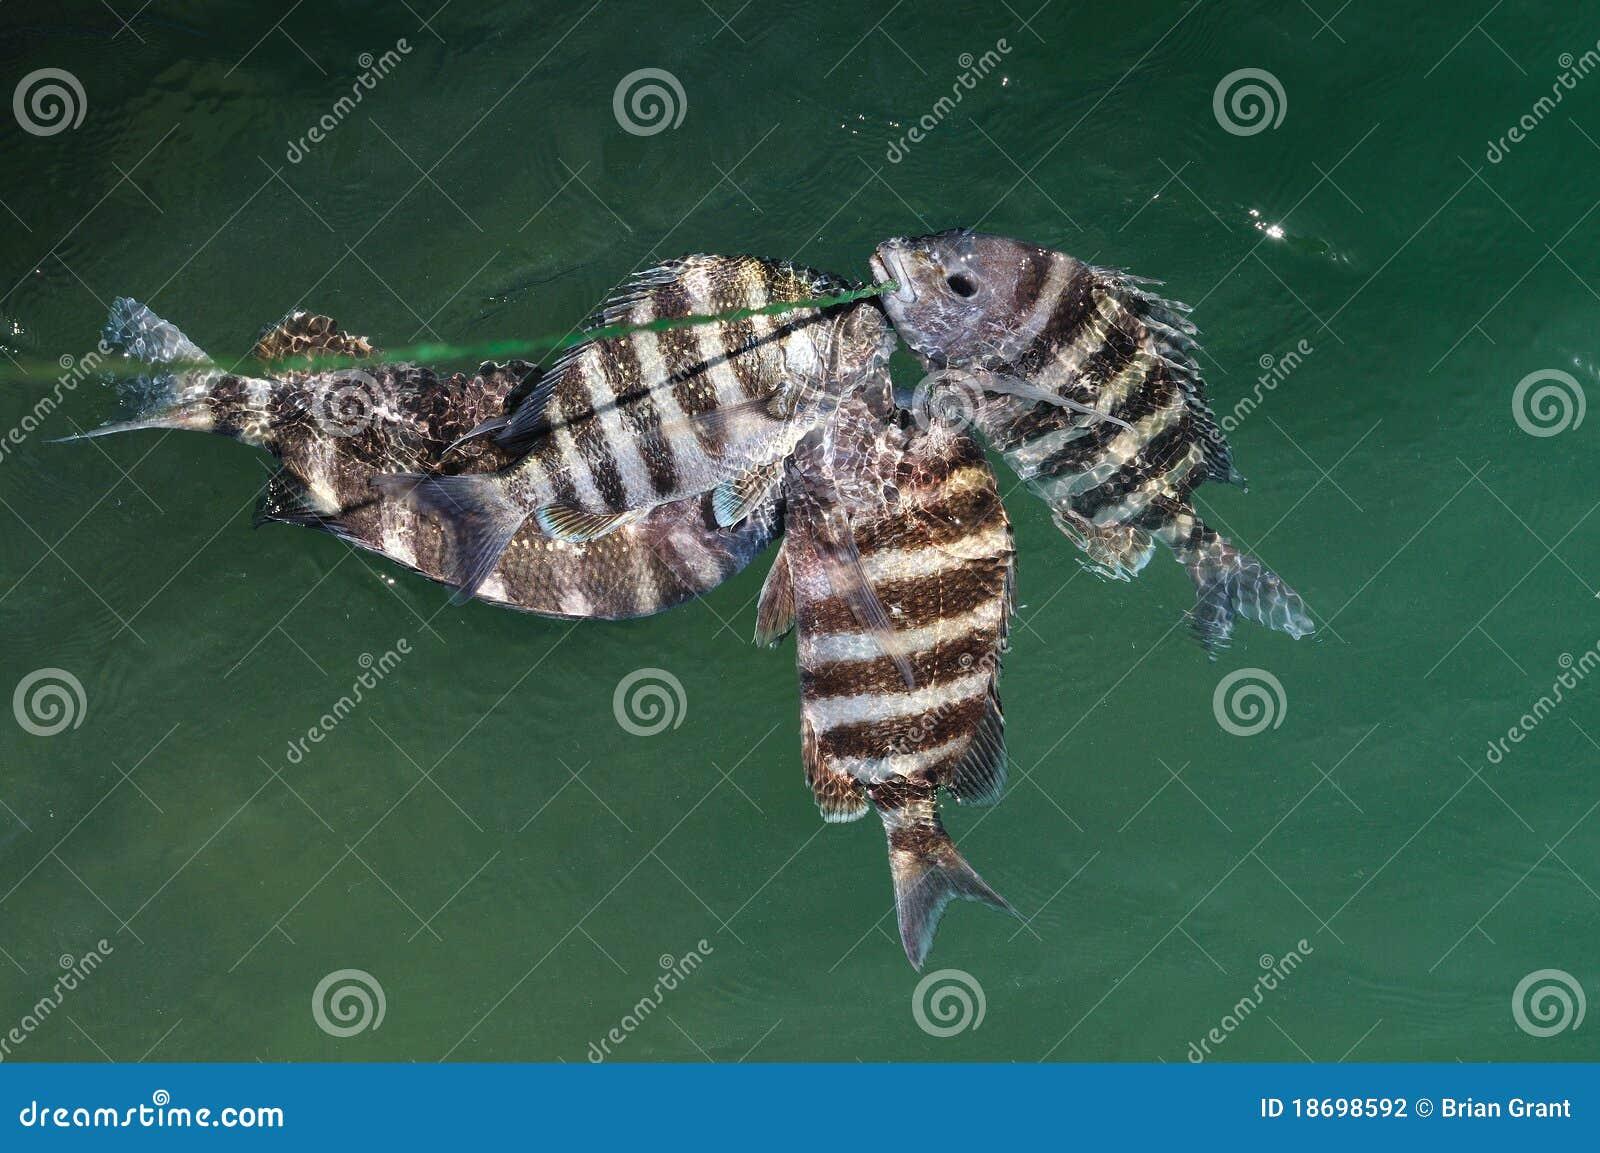 Sheepshead Fish Archosargus Probatocephalus Stock ...Saltwater Sheepshead Fish Good To Eat